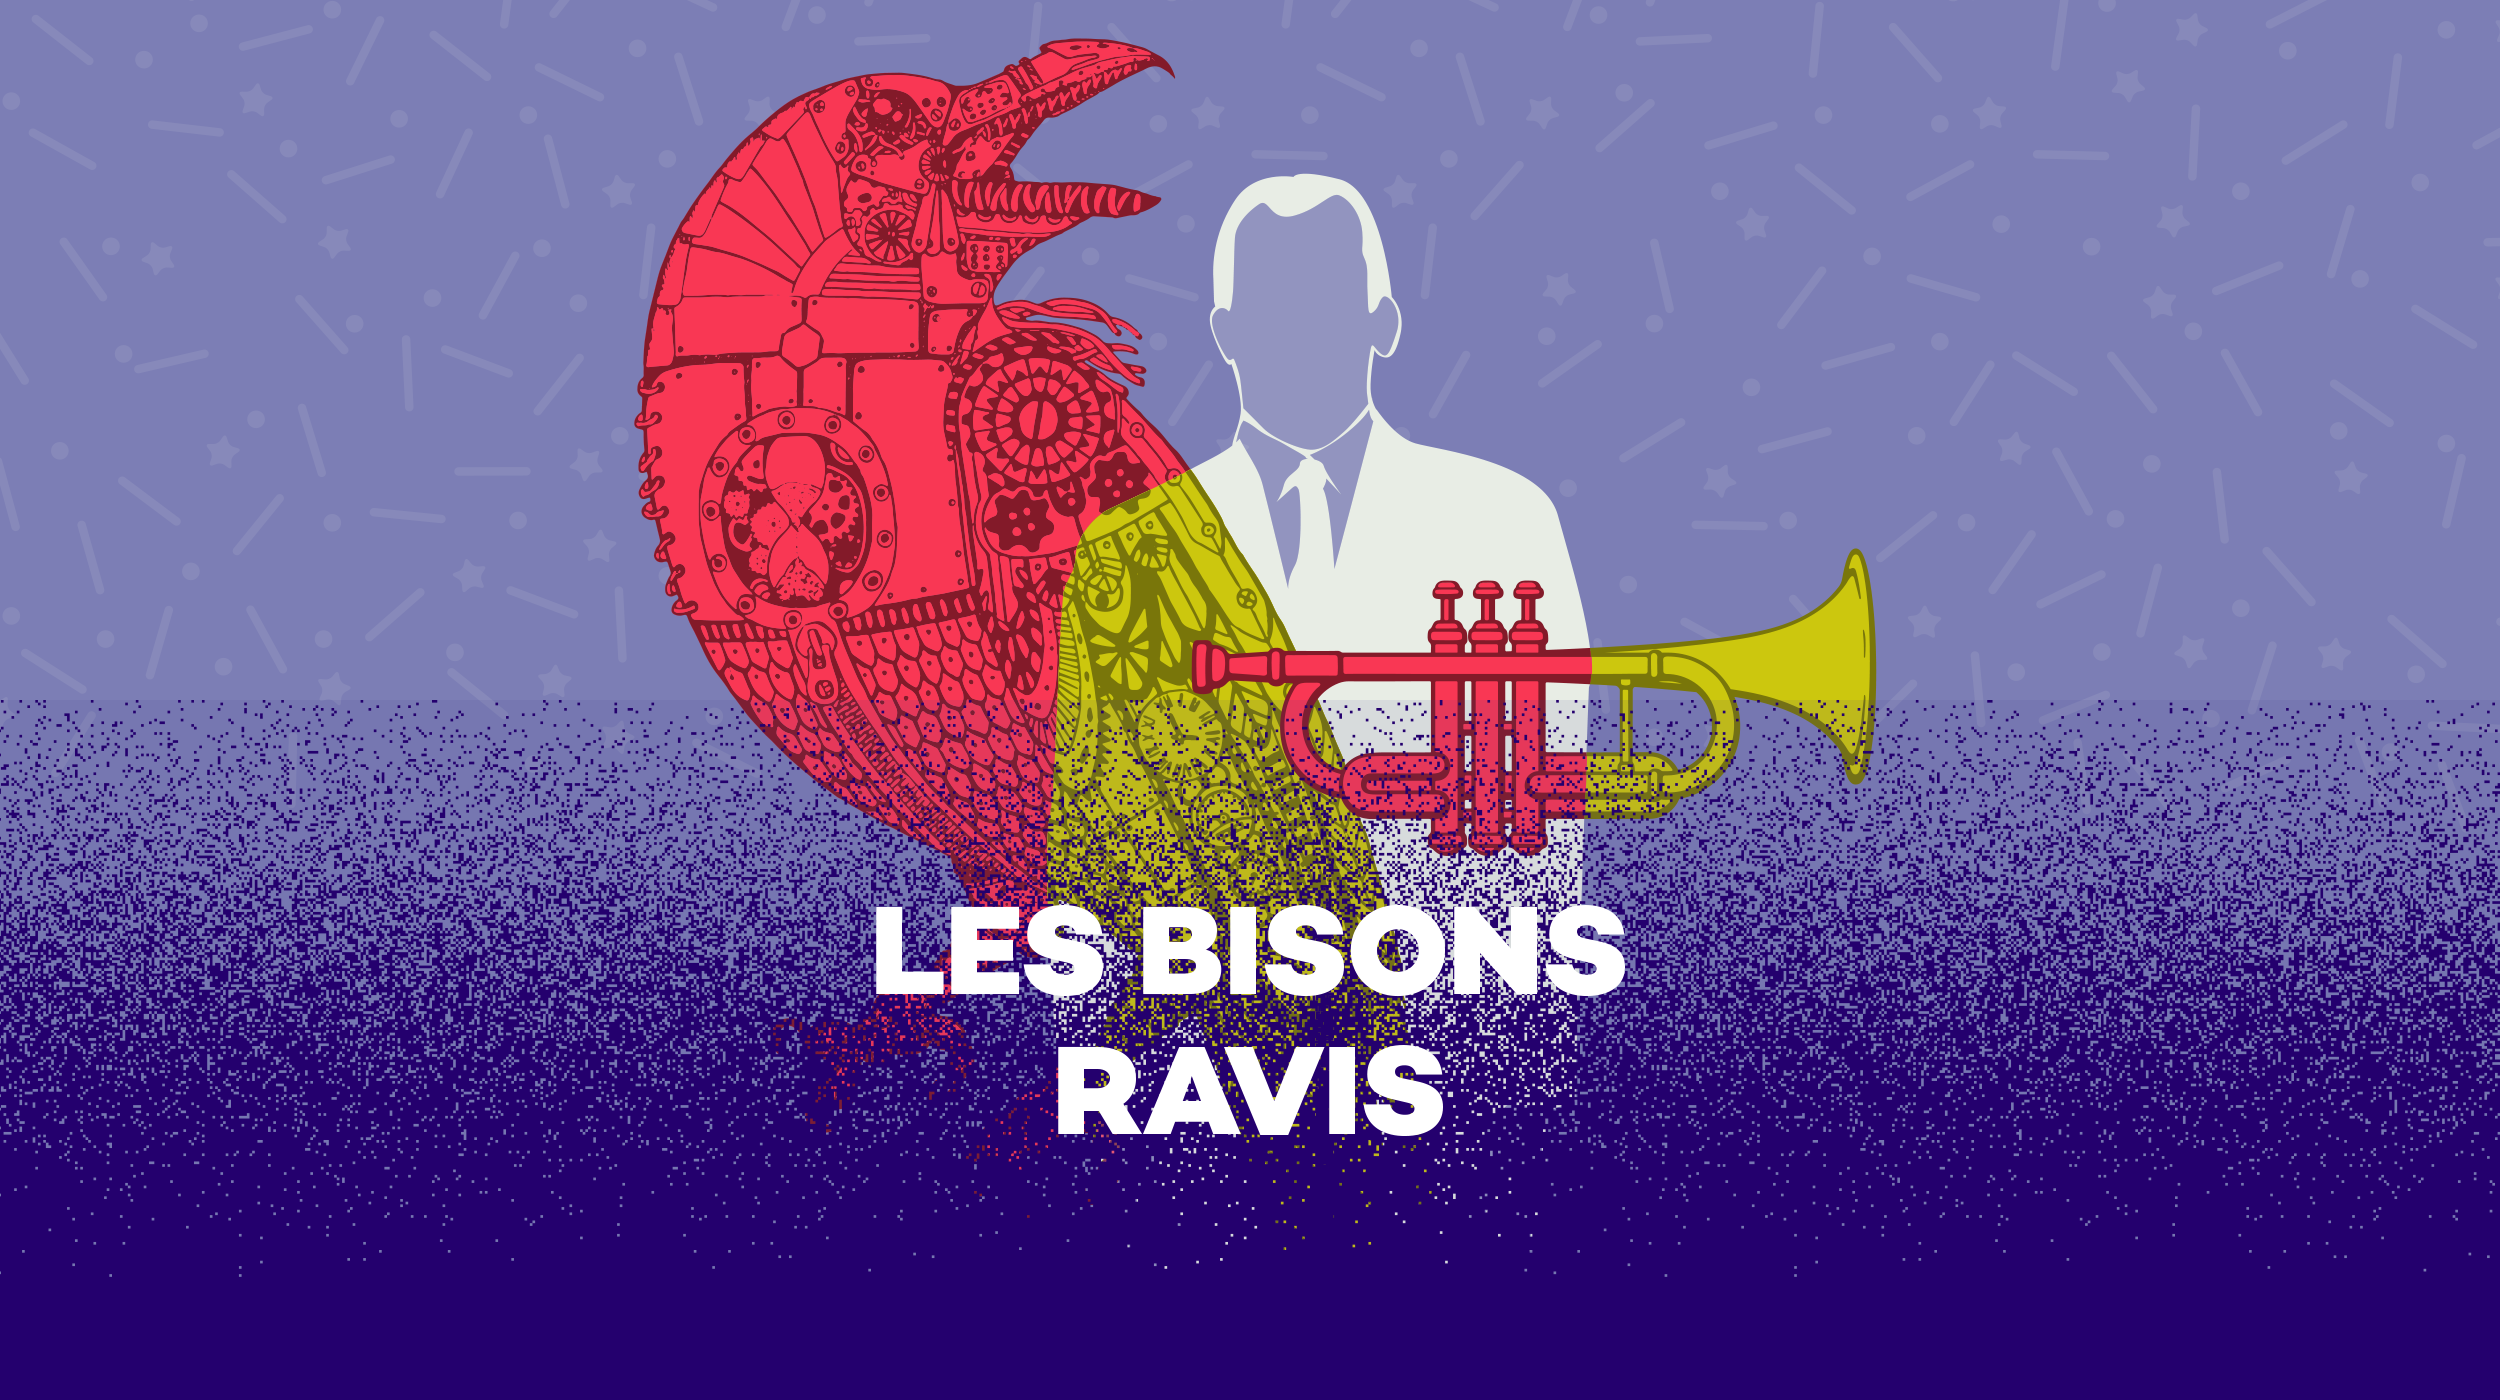 Logo Les bisons ravis [RTS]